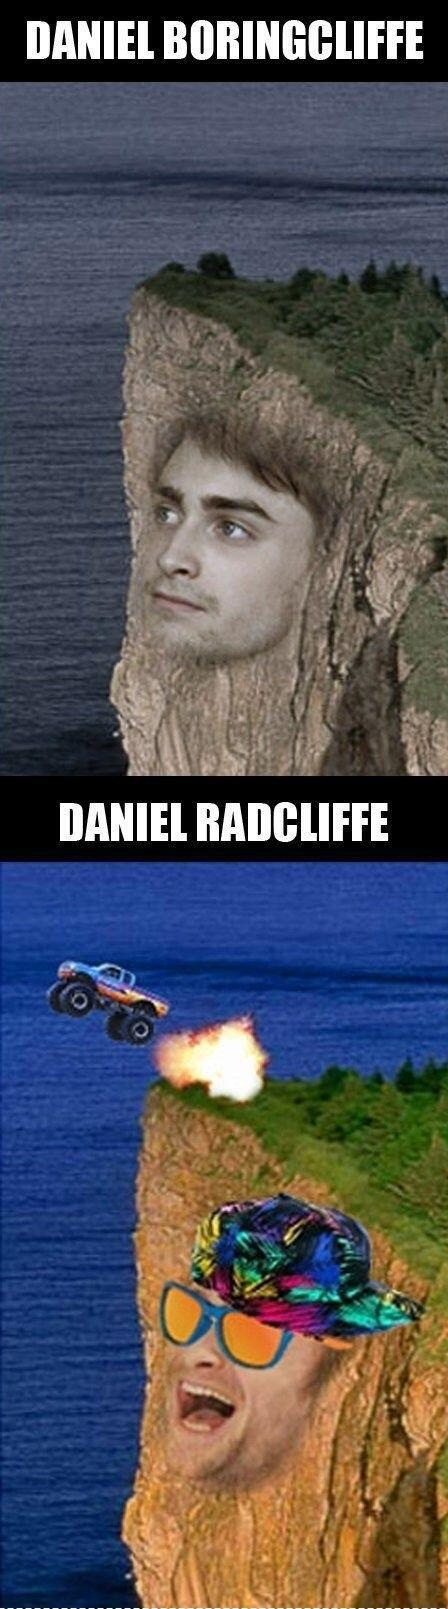 Daniel Radcliffe http://t.co/fMoCmpojvT